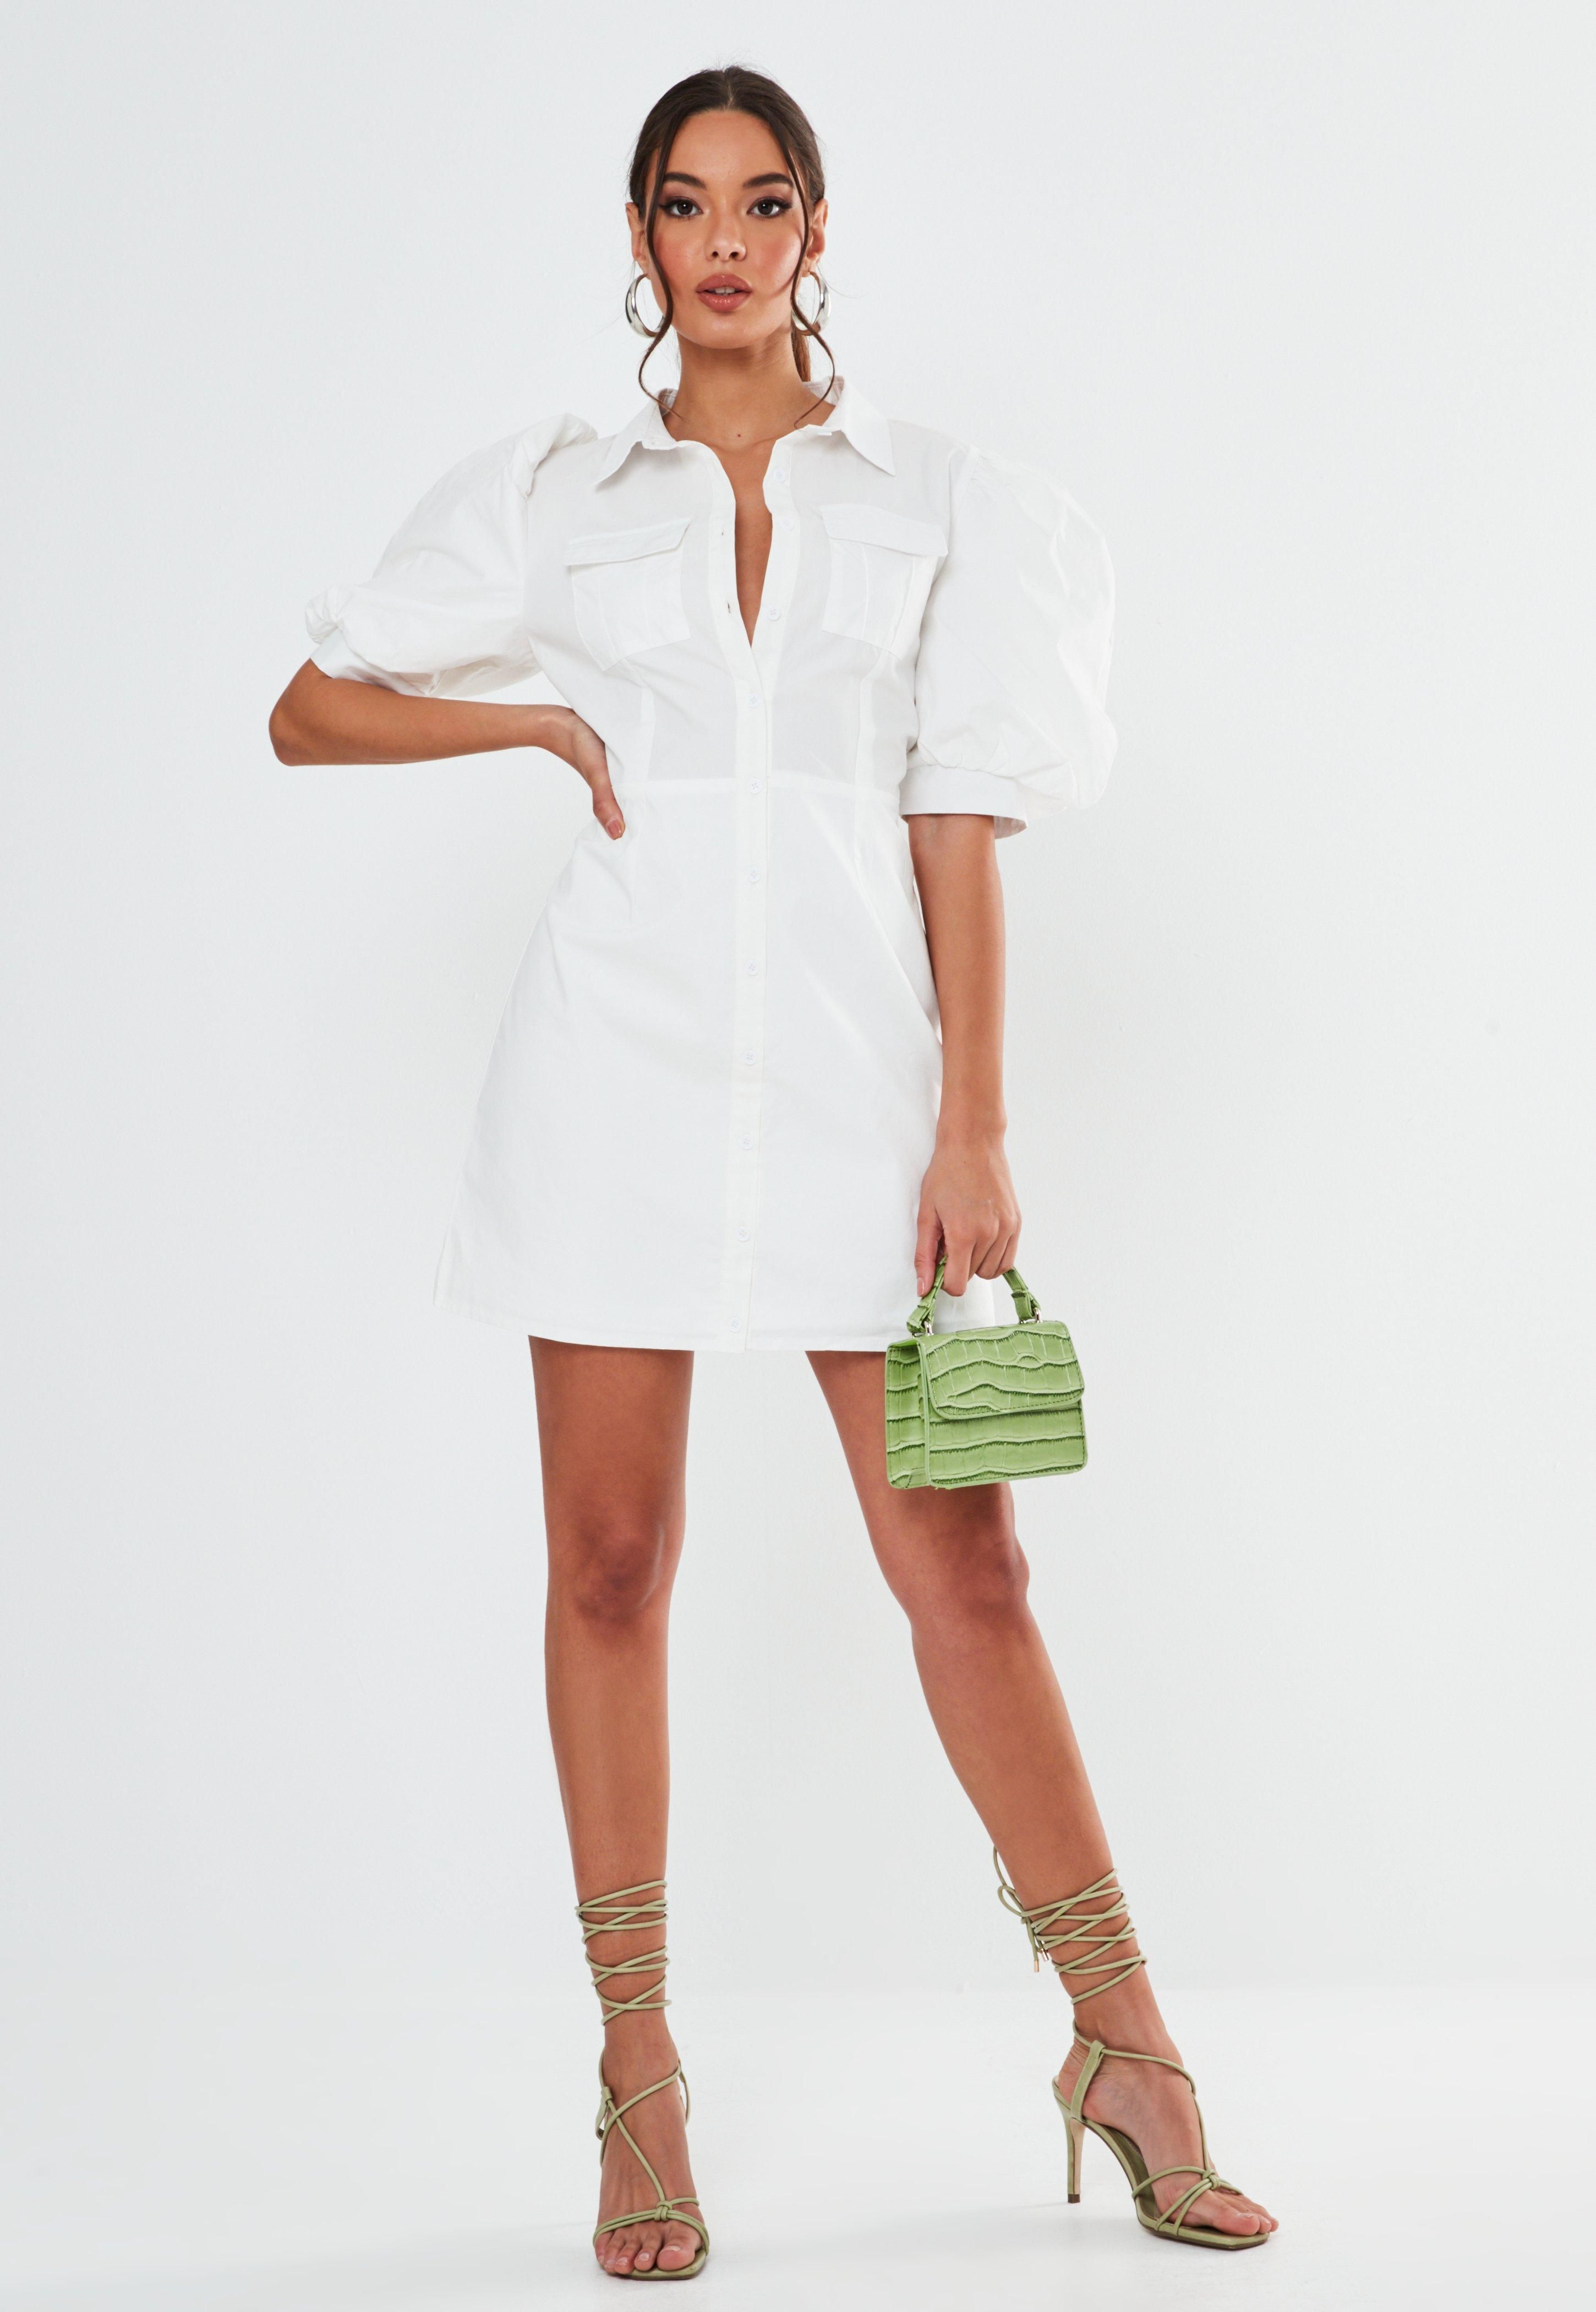 Size UK Women Striped Mini Shirt Dress Ladies Party Long Puff Sleeve Top Dresses